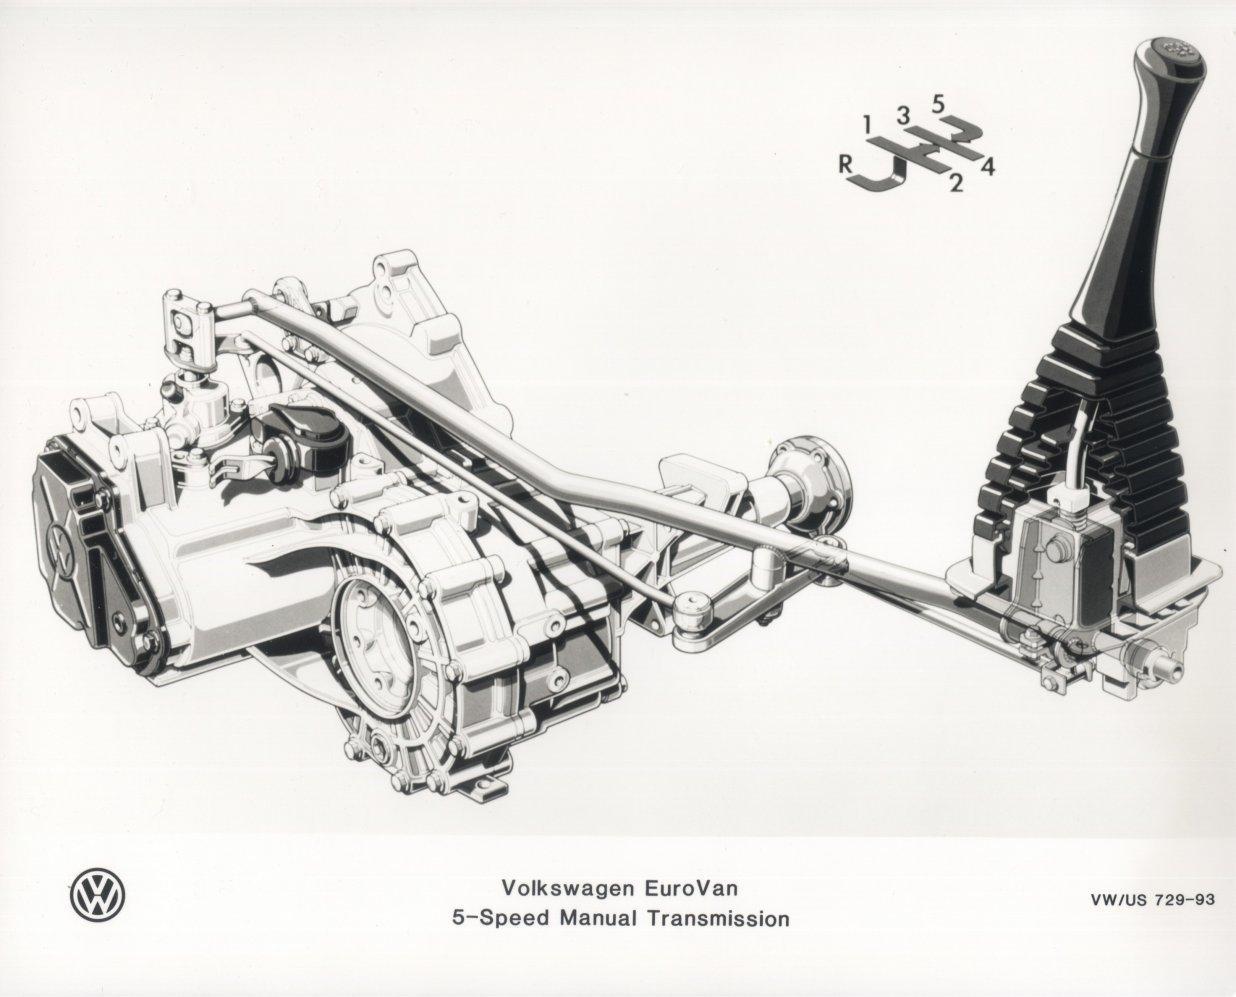 93 EV manual transmission graphic